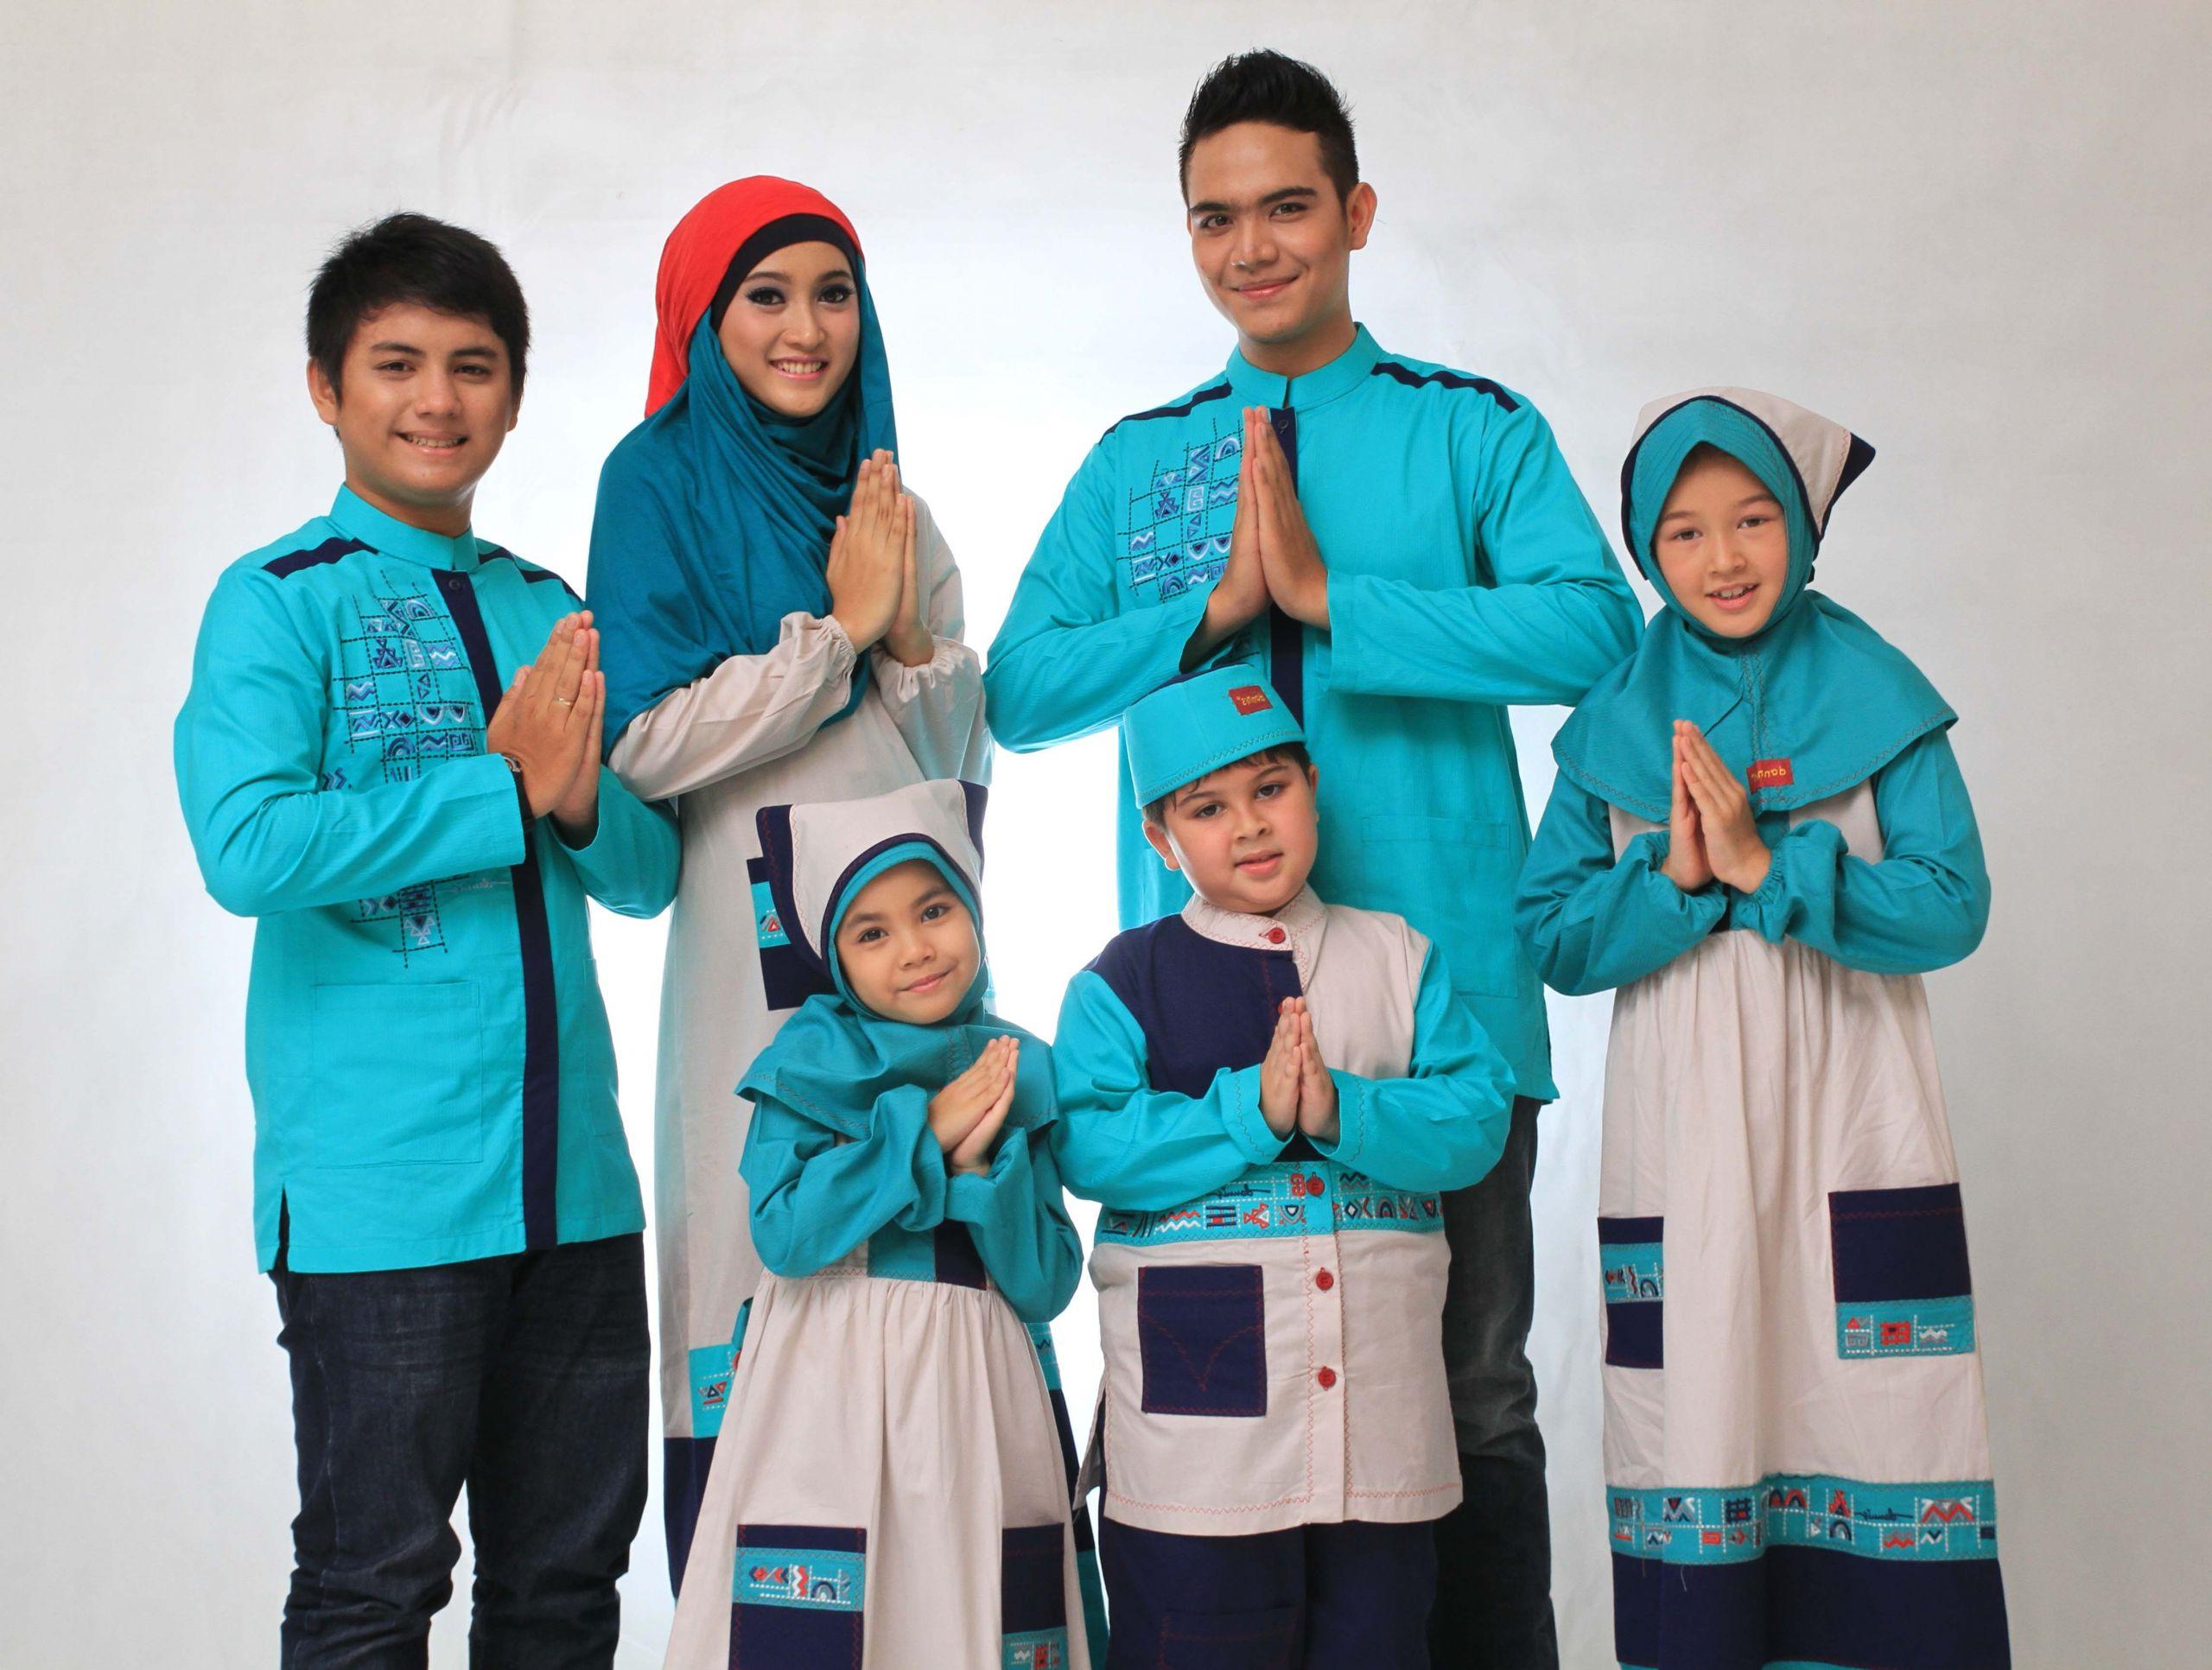 Inspirasi Inspirasi Baju Lebaran Keluarga 2018 Jxdu Baju Muslim Untuk Lebaran Berhijab